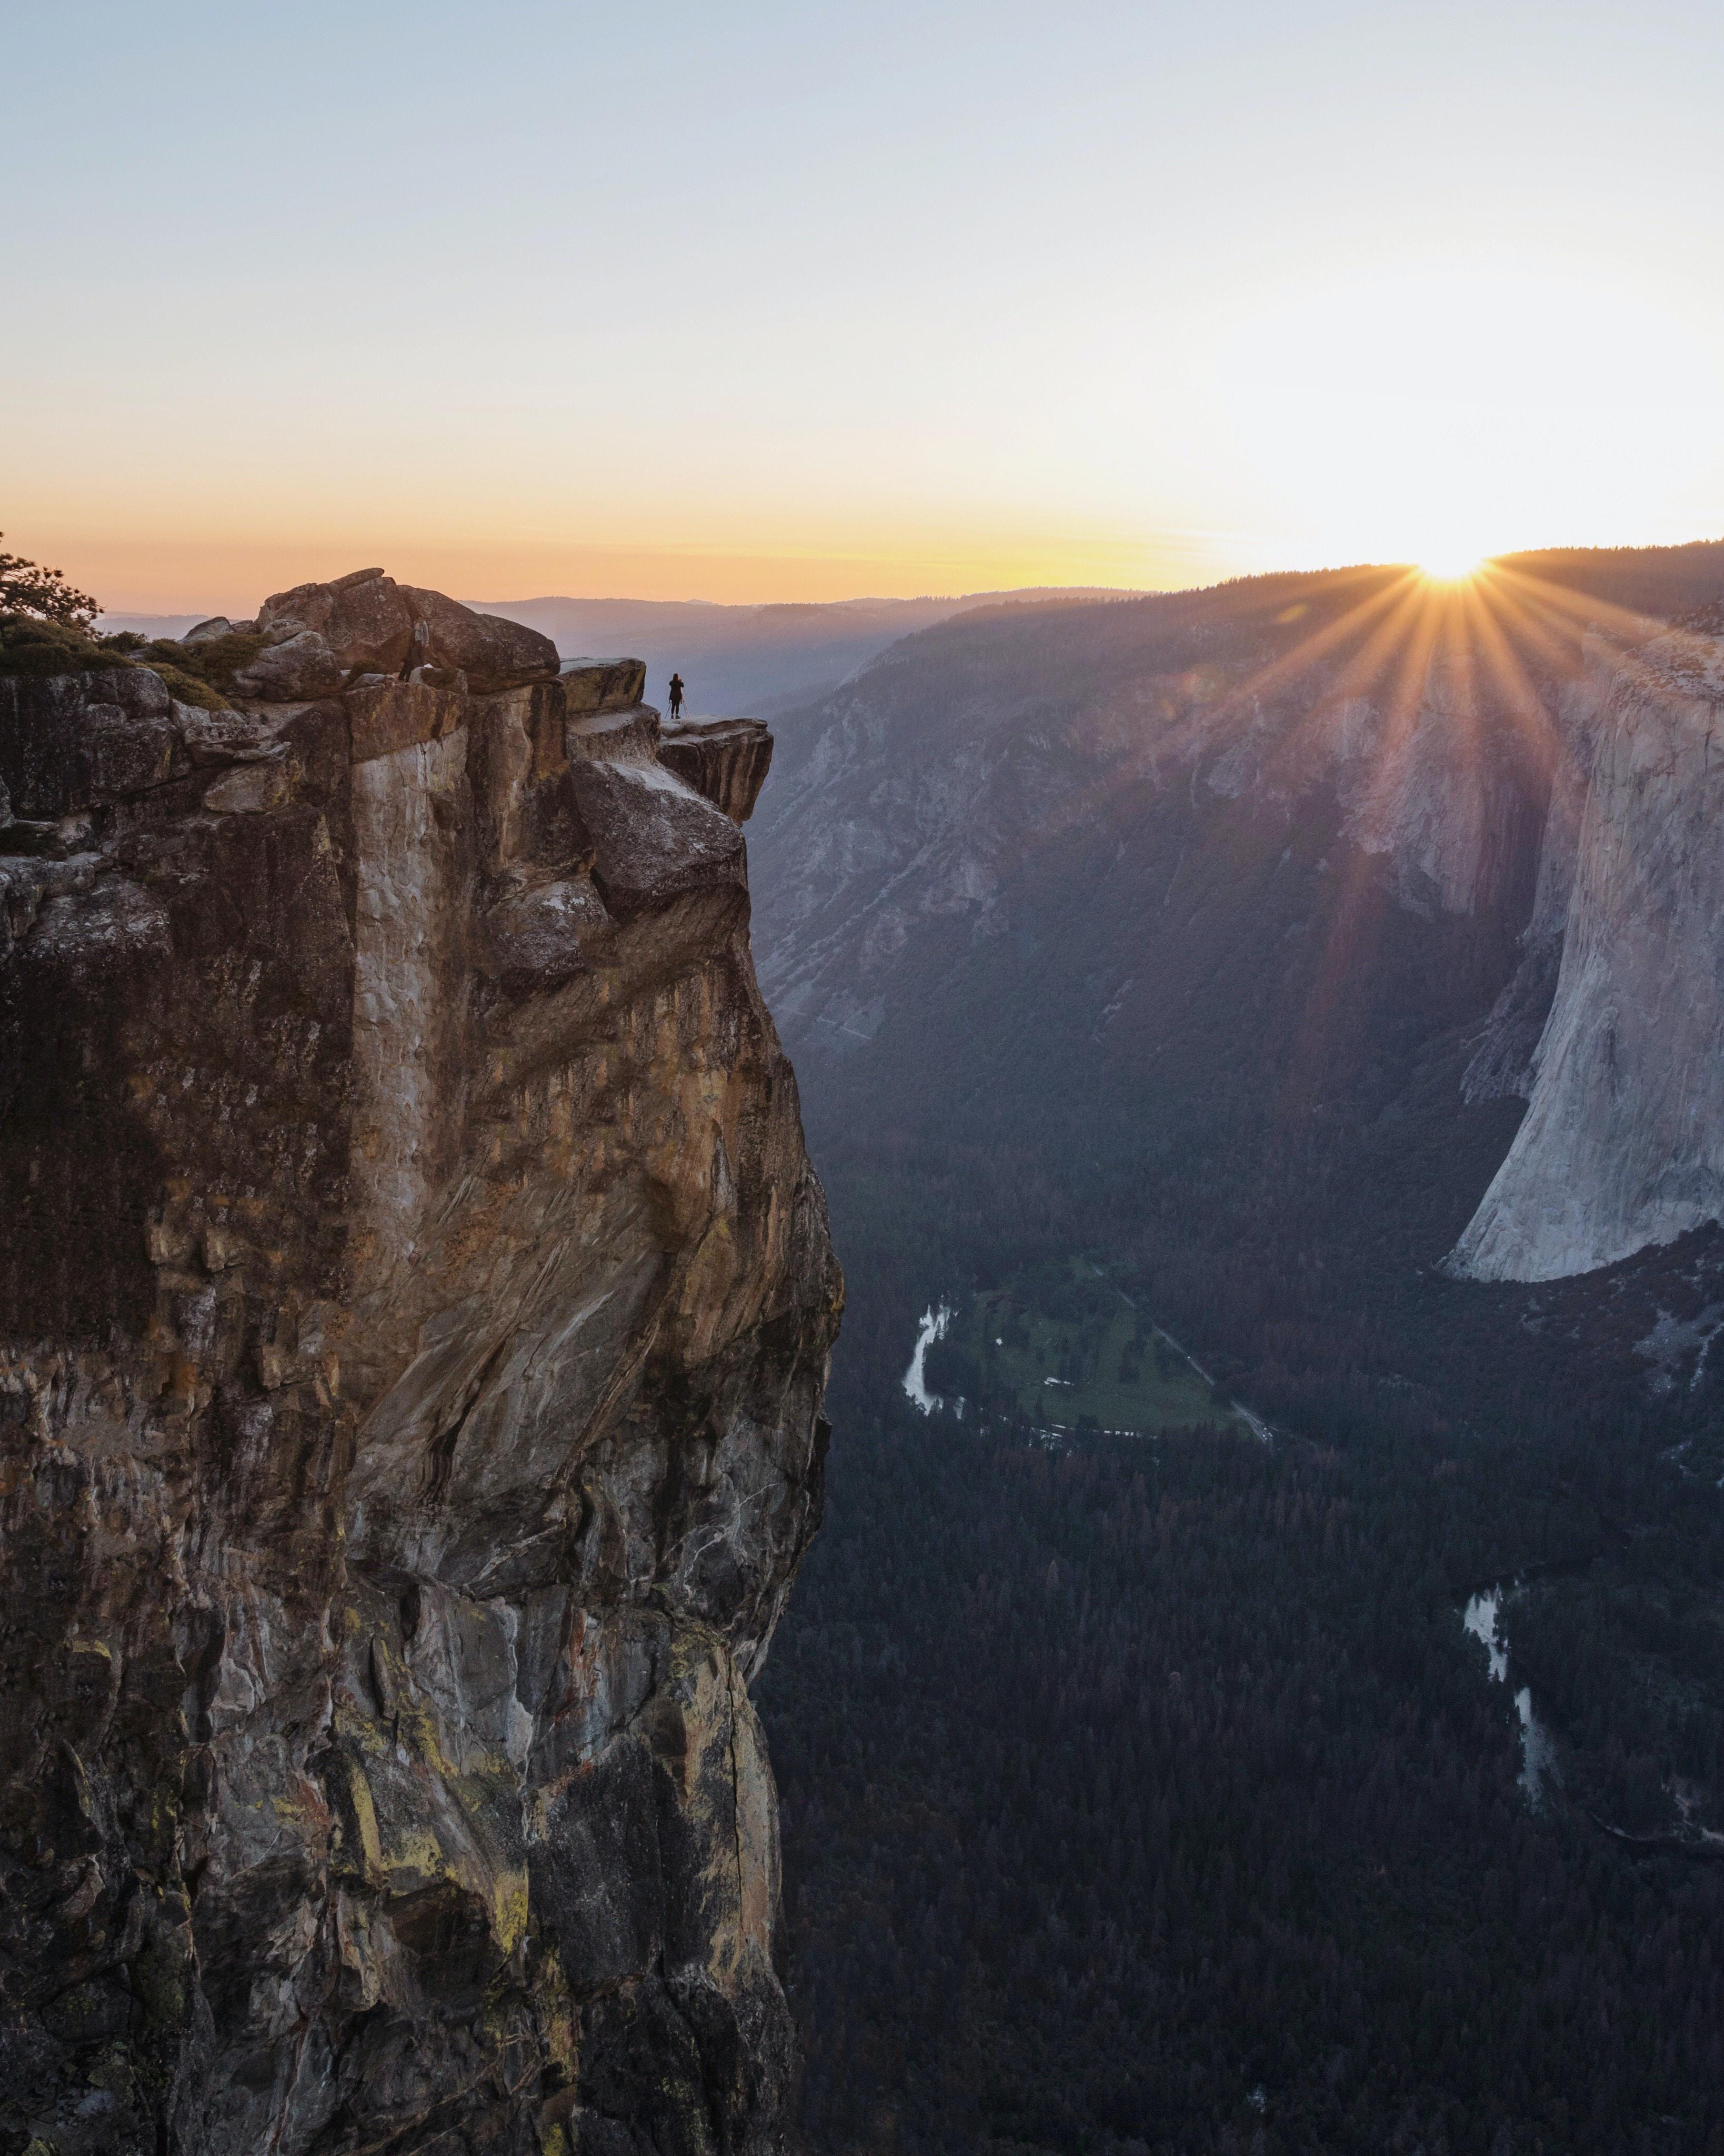 Sun shines on the horizon over a rocky mountain ridge